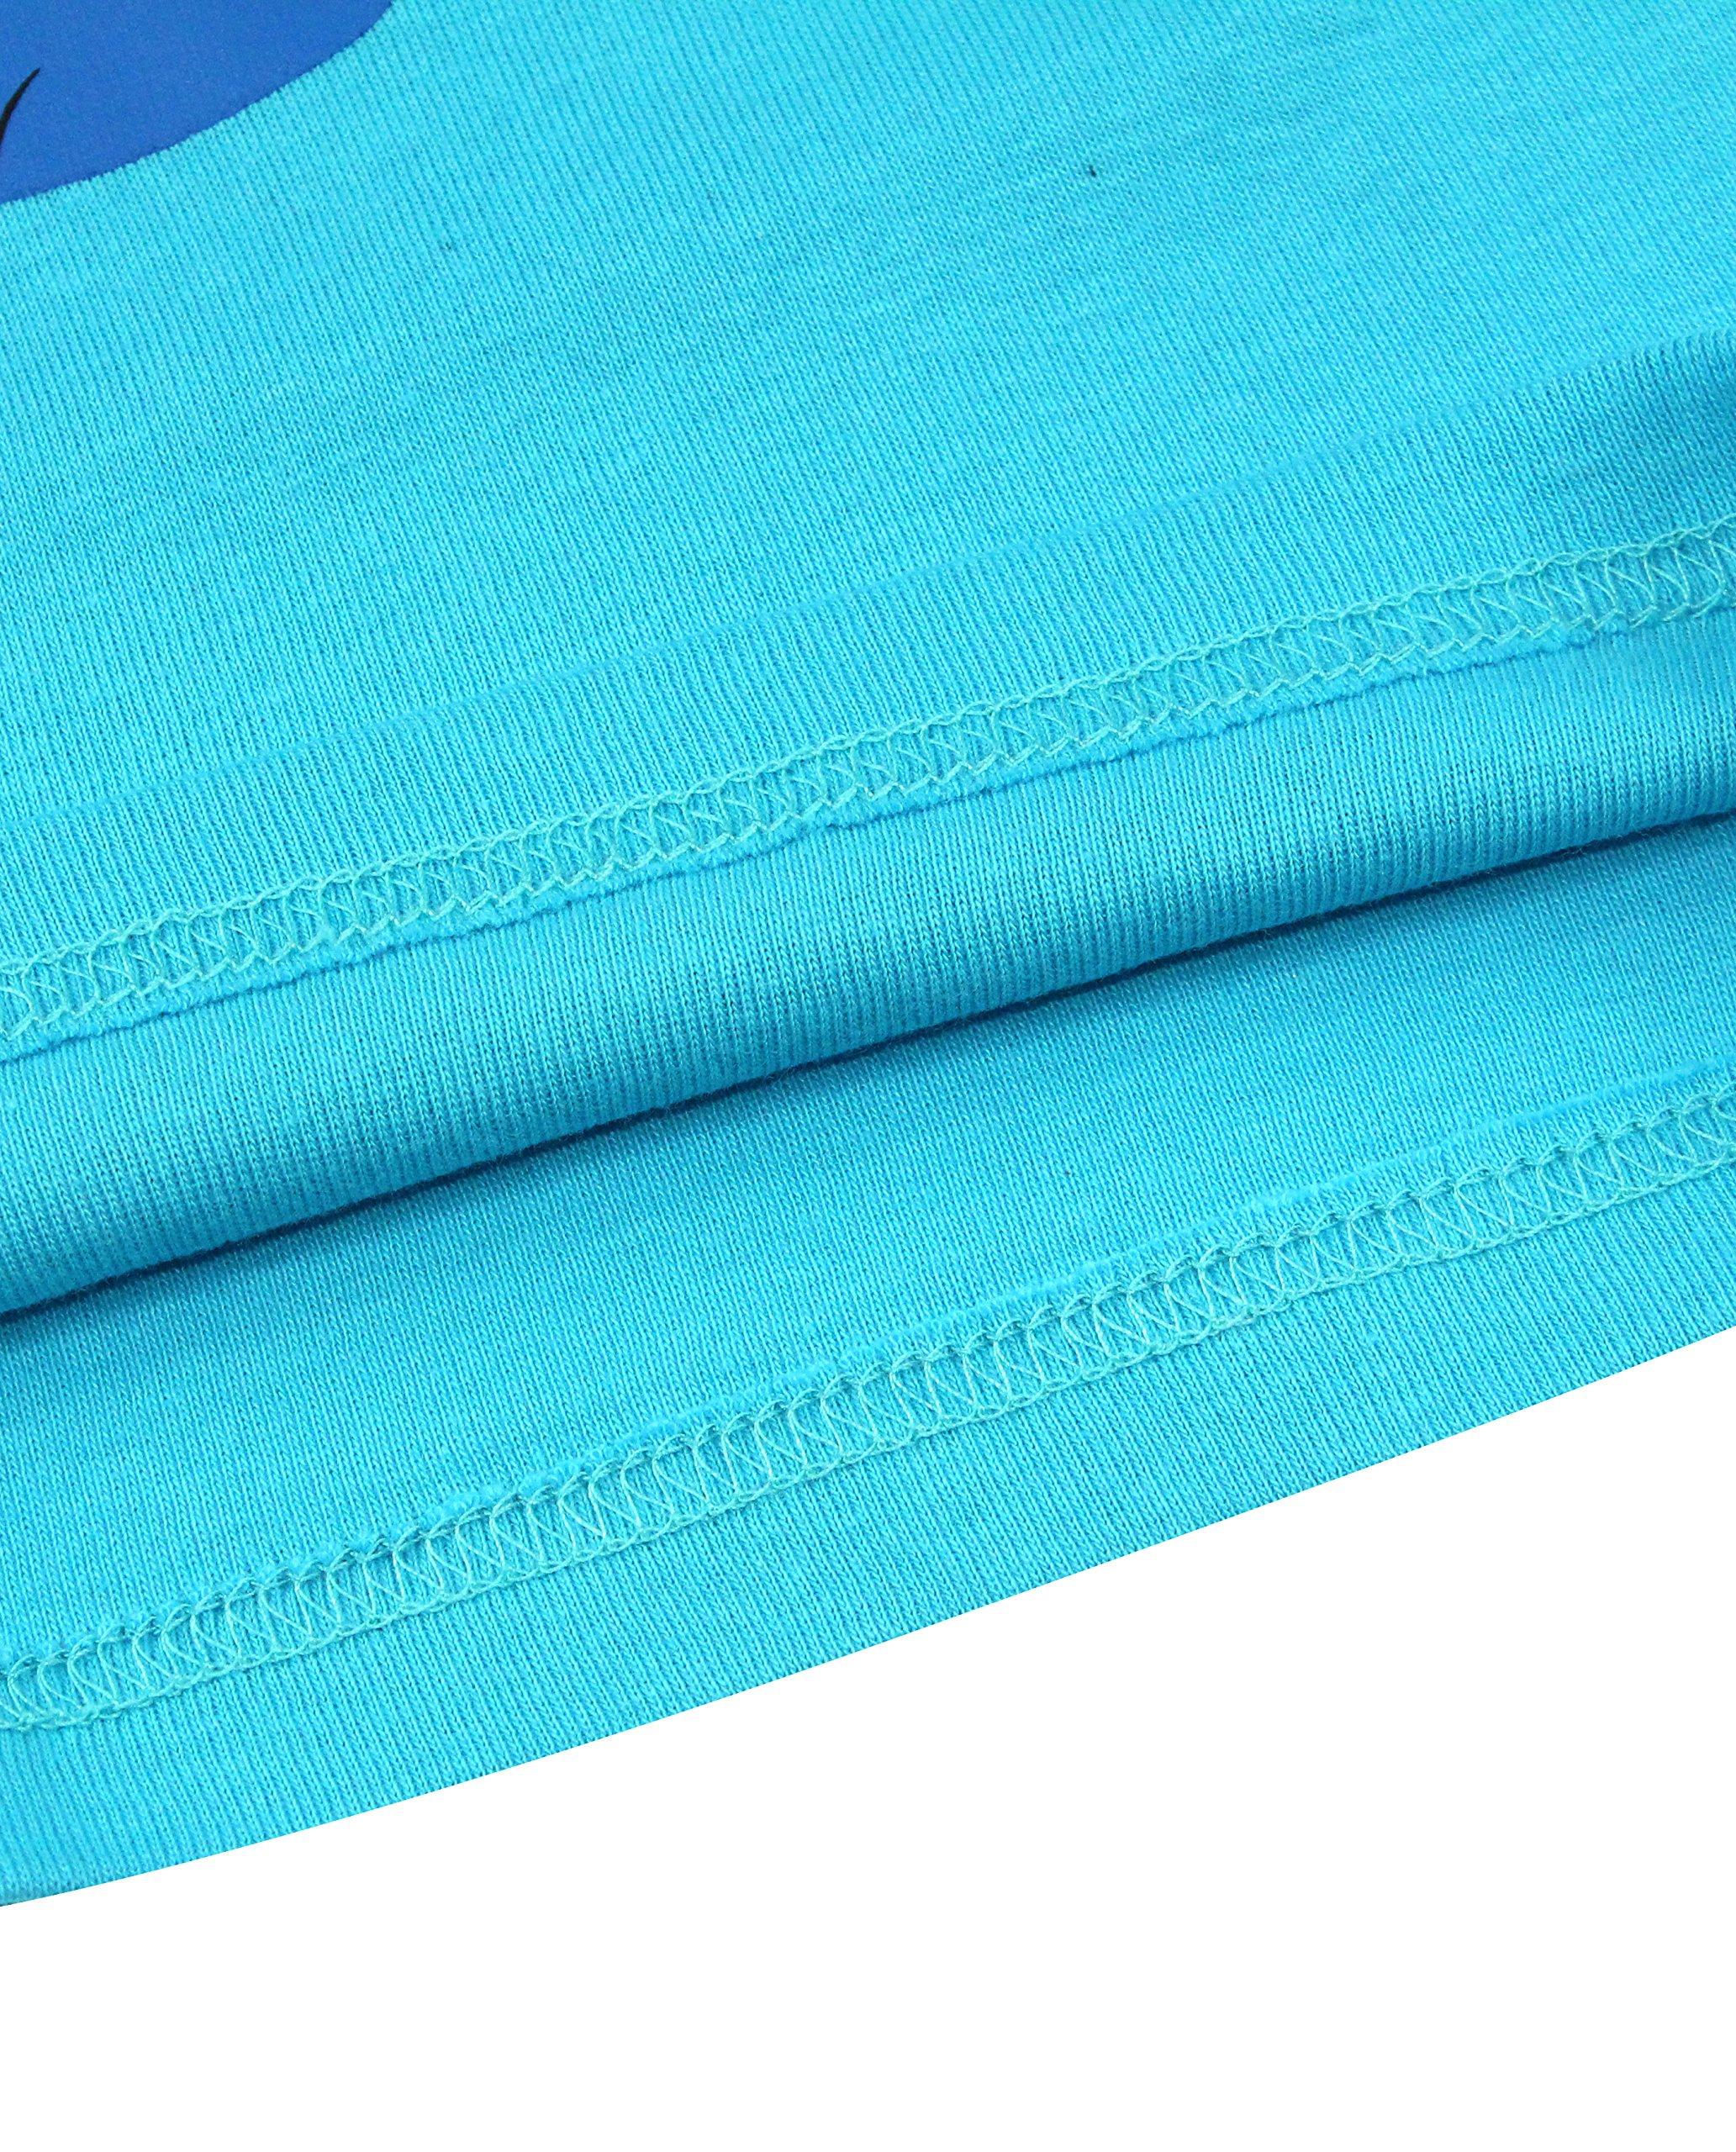 Boys Pajamas Boys Dinosaur Little Kid Shorts Set 100% Cotton Clothes Short Sleeves Sleepwear 8Y by shelry (Image #7)